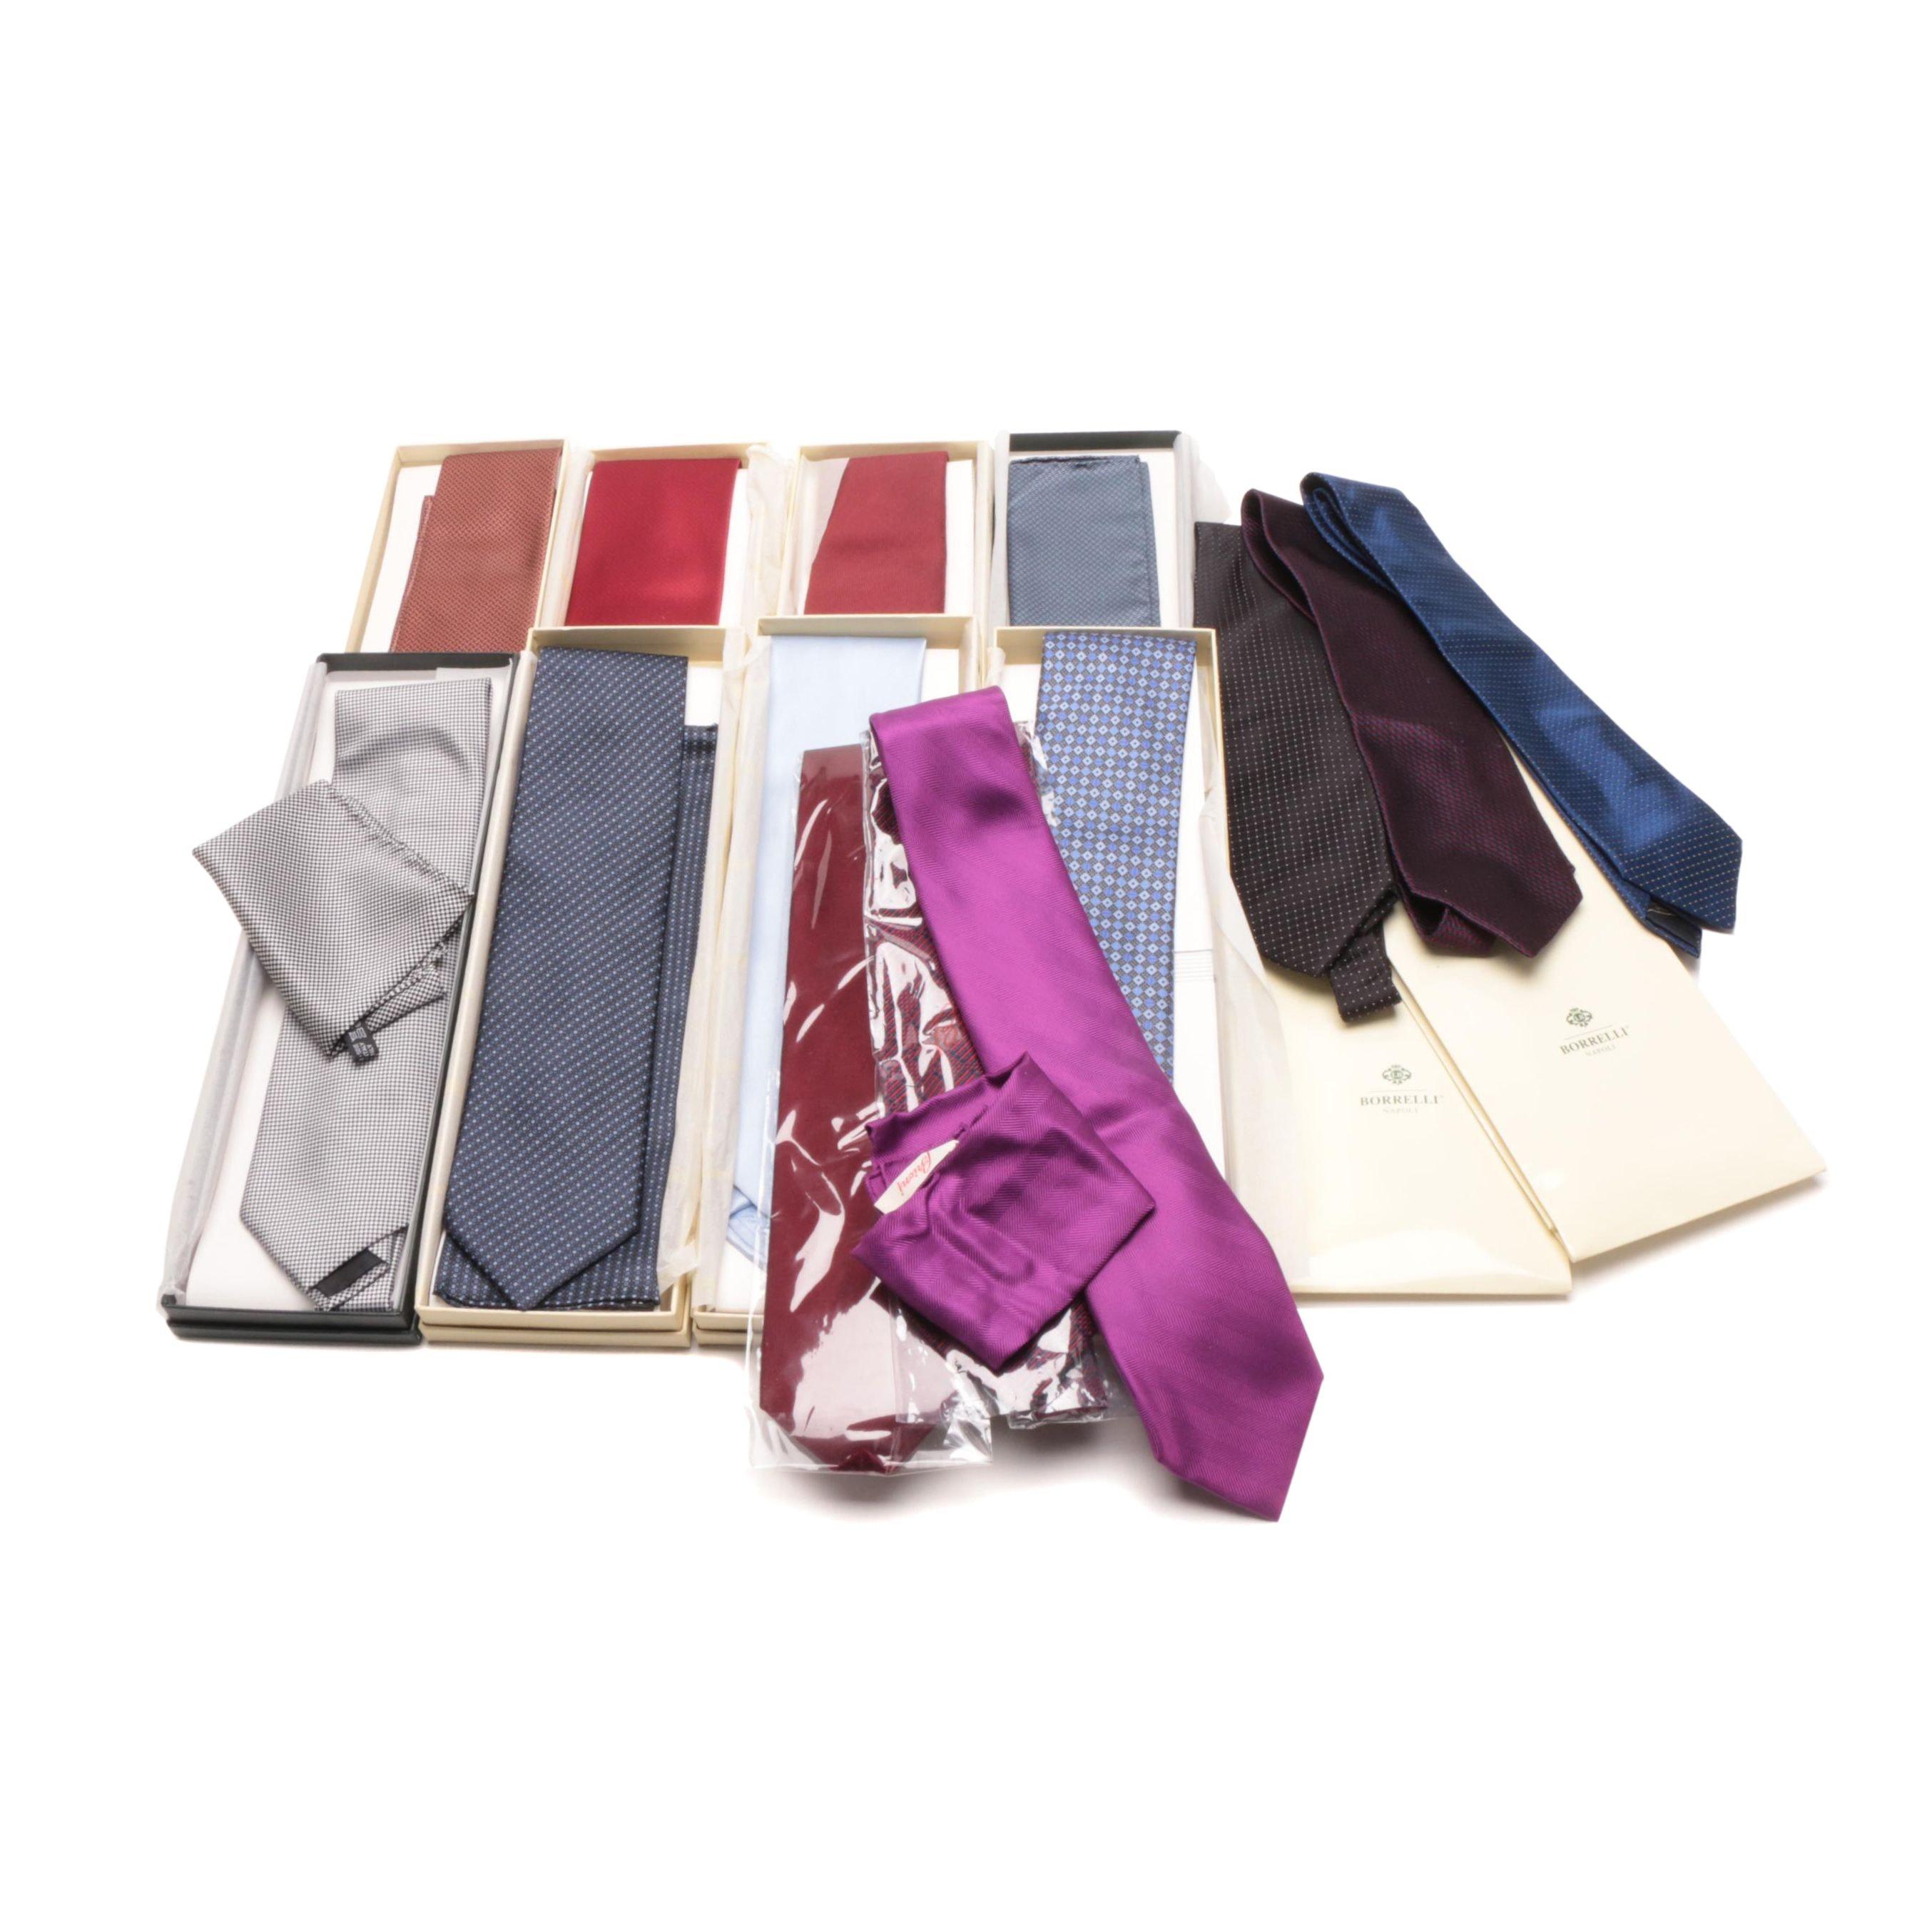 Men's Silk Neckties and Pocket Squares including Brioni and Borrelli